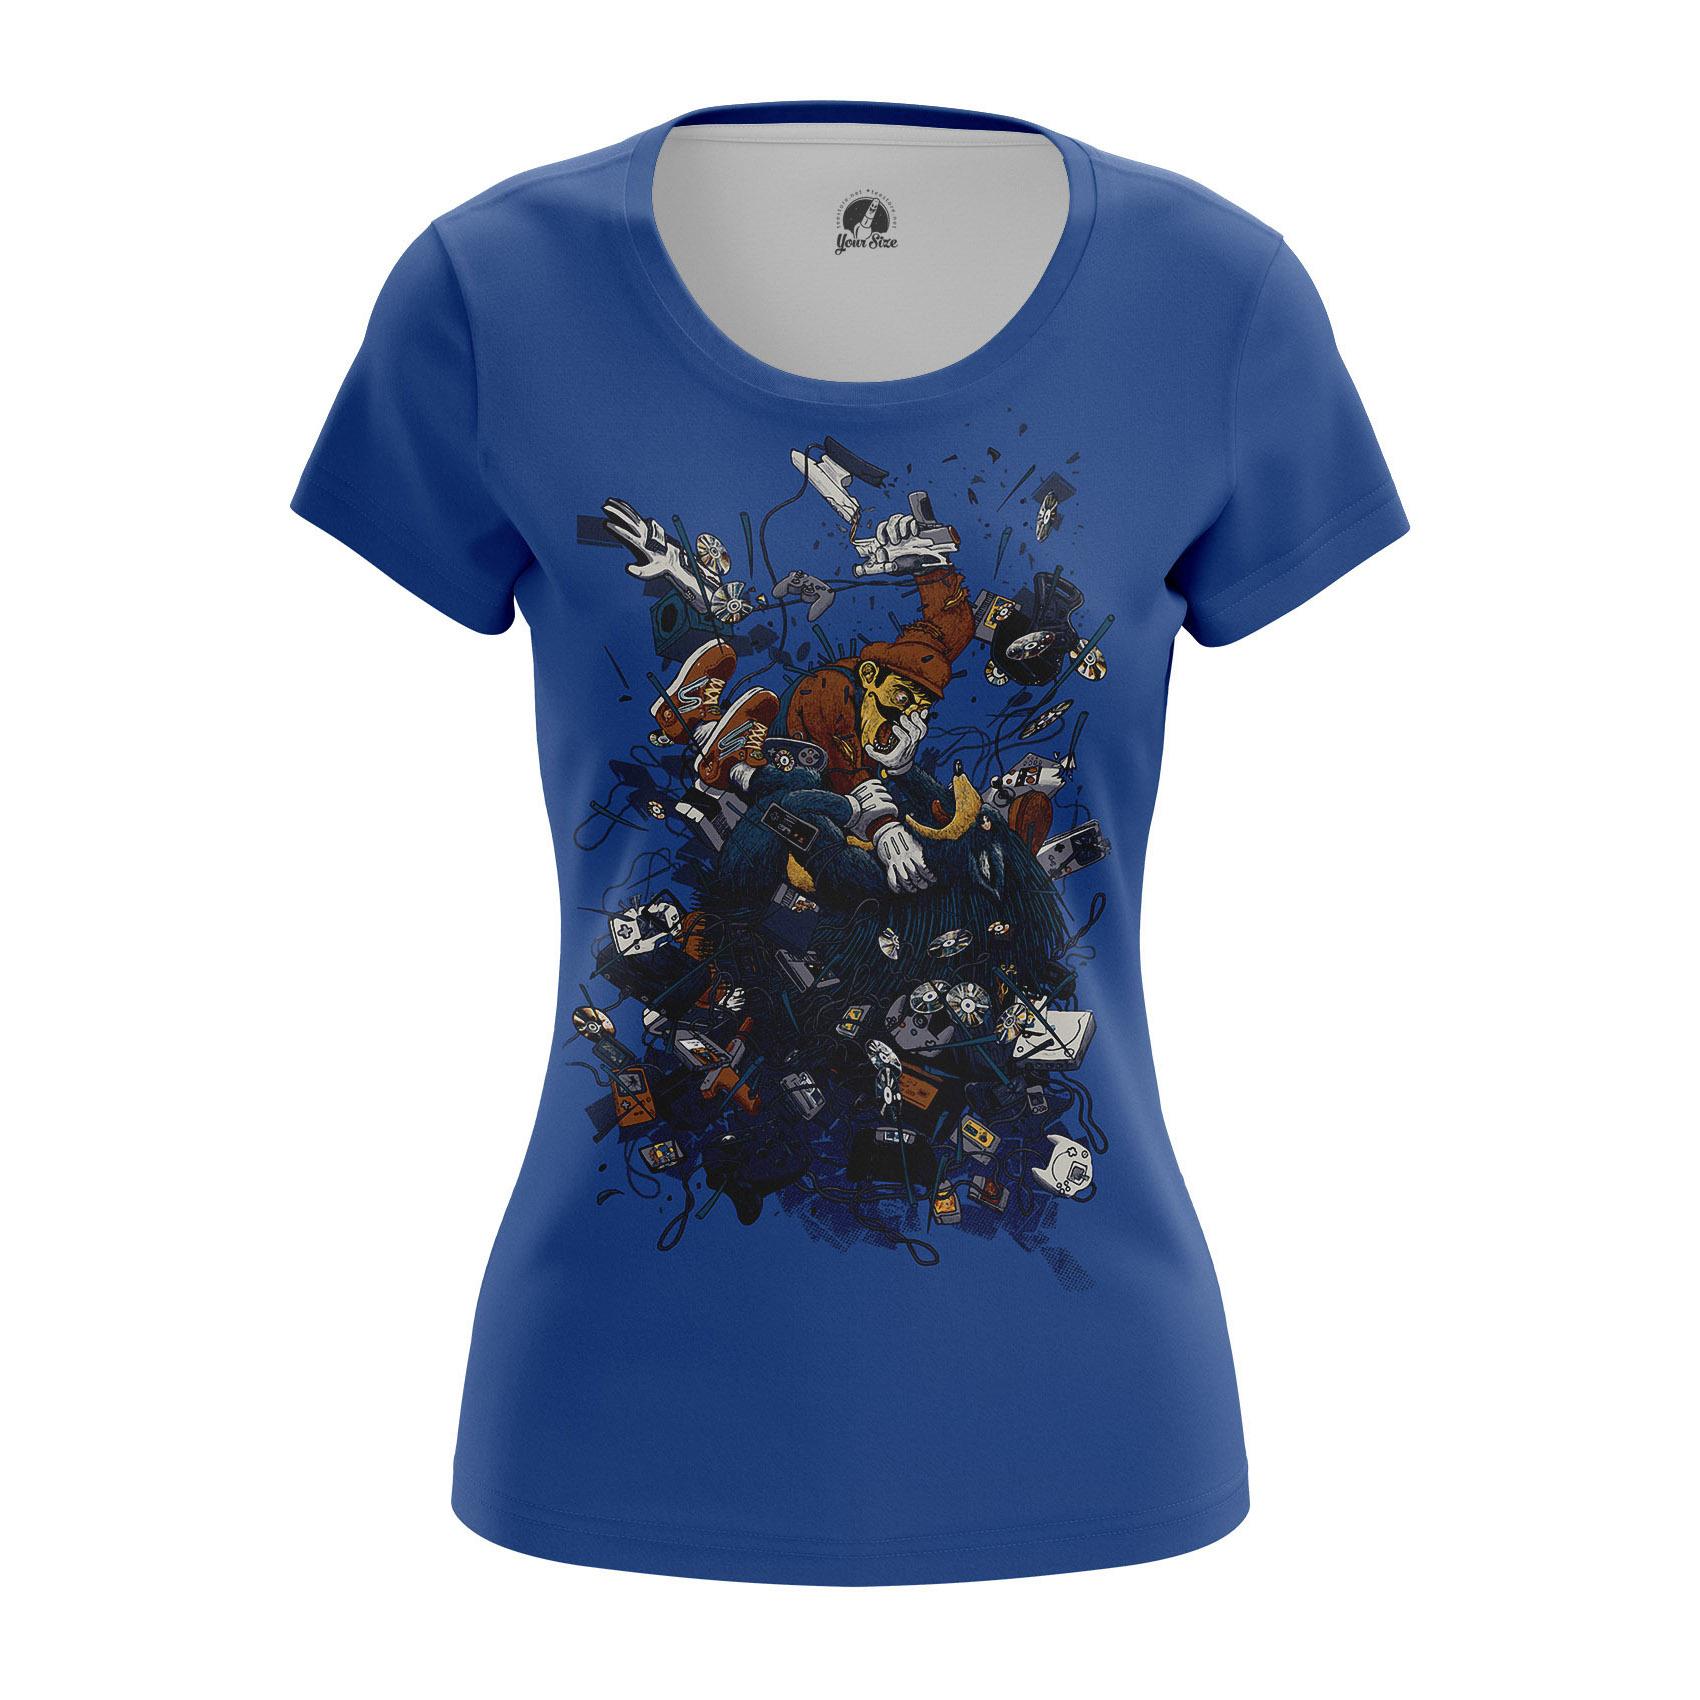 Merchandise Women'S T-Shirt Nintendo Brawl Classic Old Games